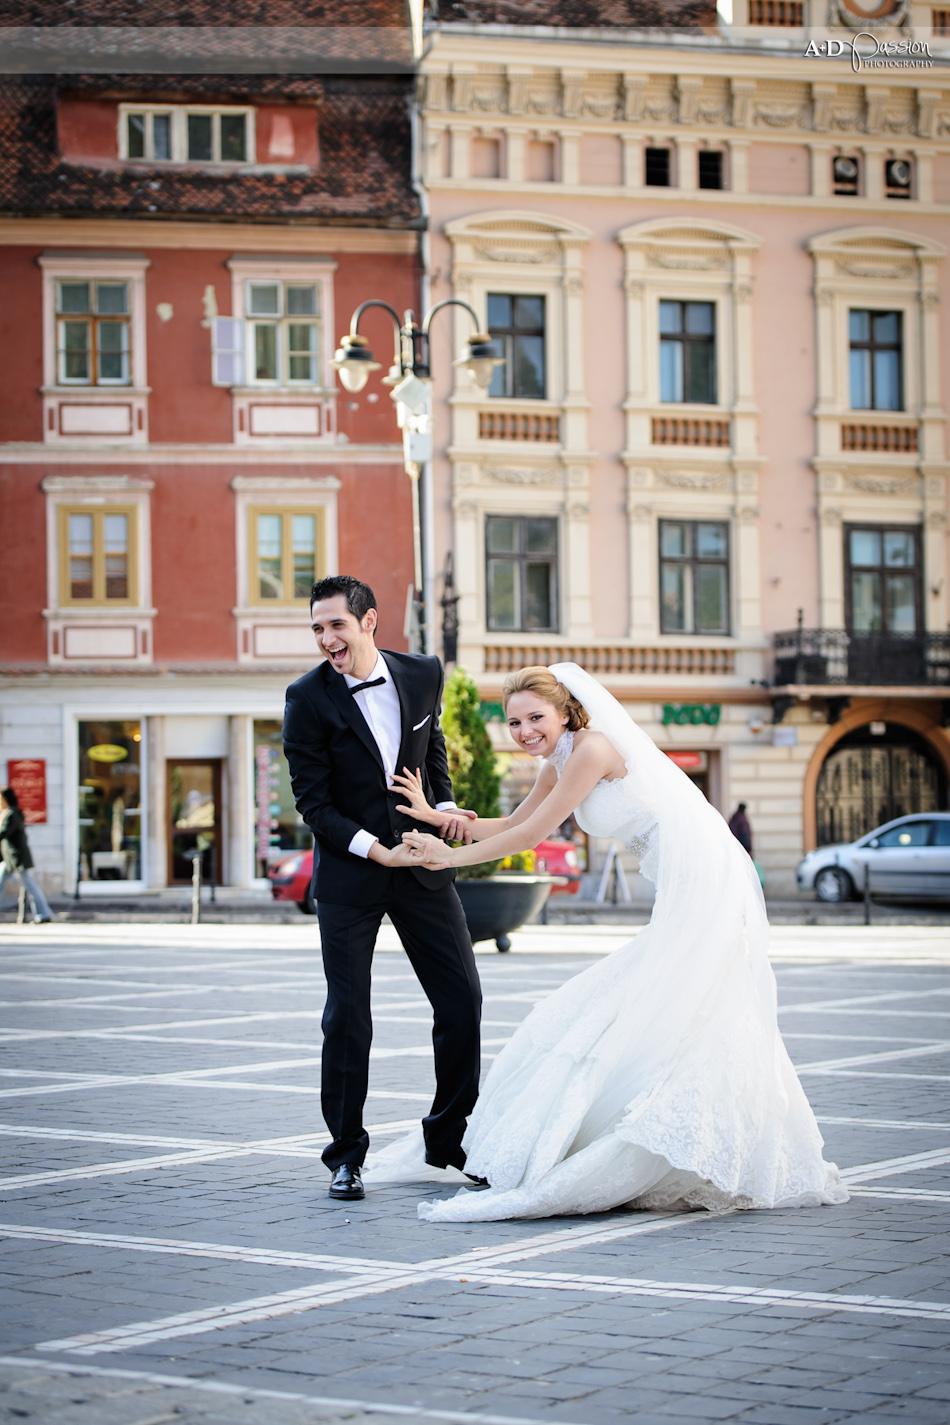 AD Passion Photography | ad-passion_fotograf-profesionist-nunta_poiana-brasov_after-wedding_trash-the-dress_nunta-brasov_fine-art-photography_iusti-si-antonia_0083 | Adelin, Dida, fotograf profesionist, fotograf de nunta, fotografie de nunta, fotograf Timisoara, fotograf Craiova, fotograf Bucuresti, fotograf Arad, nunta Timisoara, nunta Arad, nunta Bucuresti, nunta Craiova